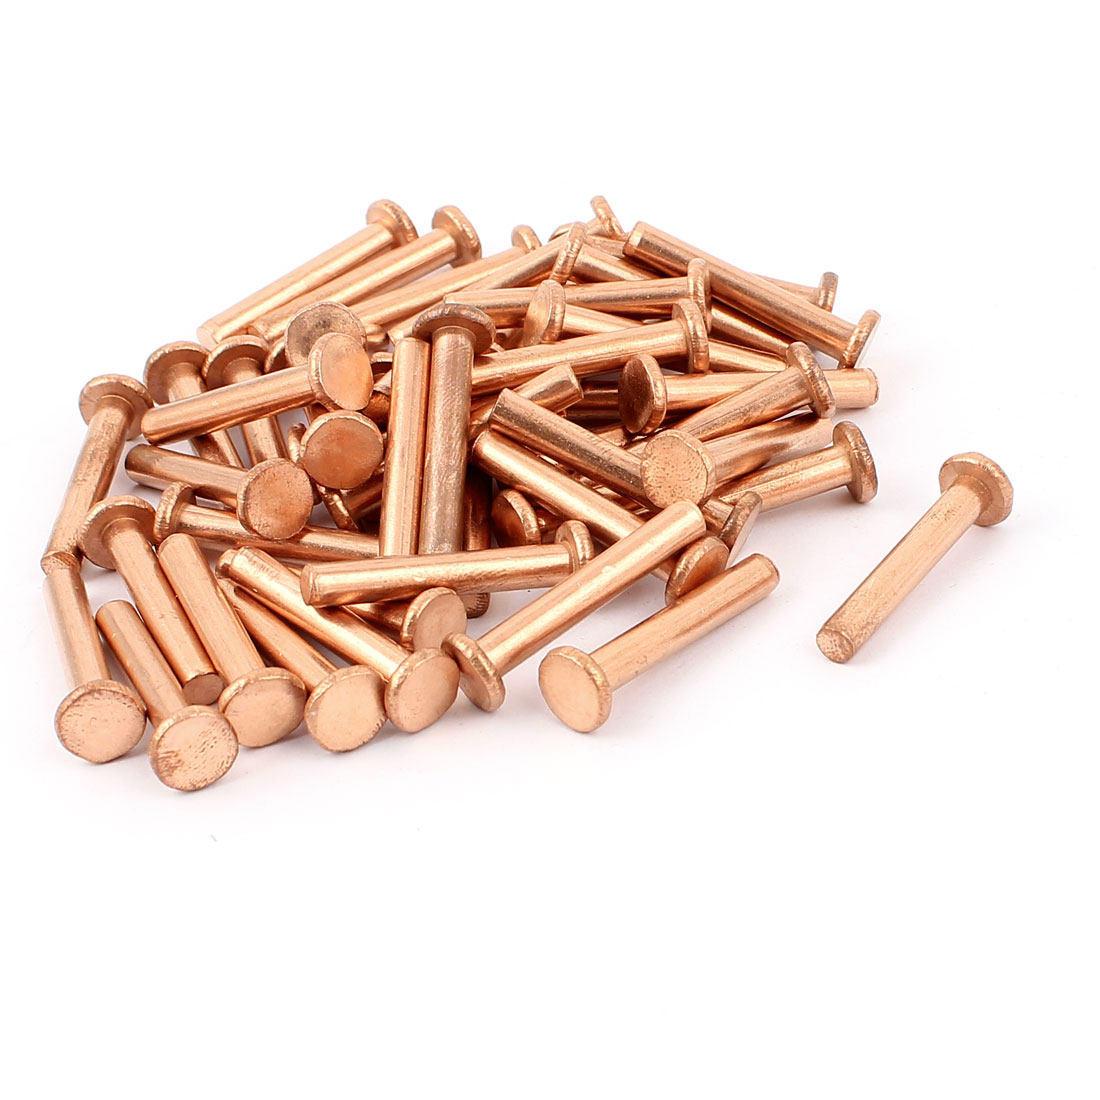 "50 Pcs 13/64"" Diameter 1 3/16"" Long Shank Flat Head Copper Solid Rivets Fasteners"